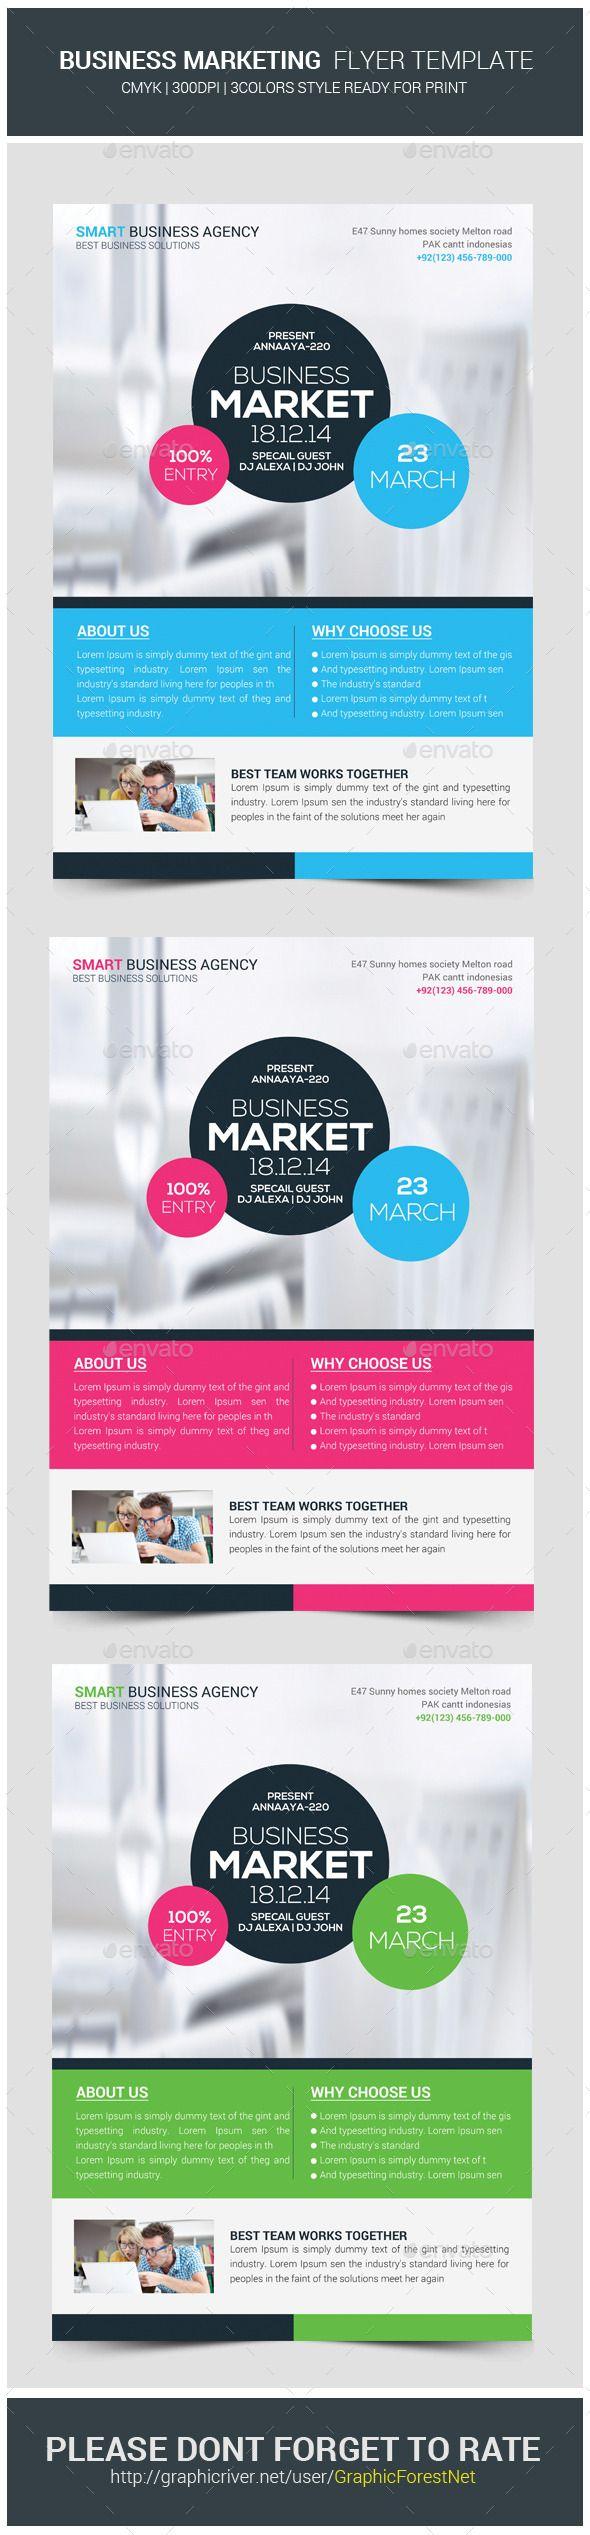 best images about flyer design psd flyer business marketing psd flyer template